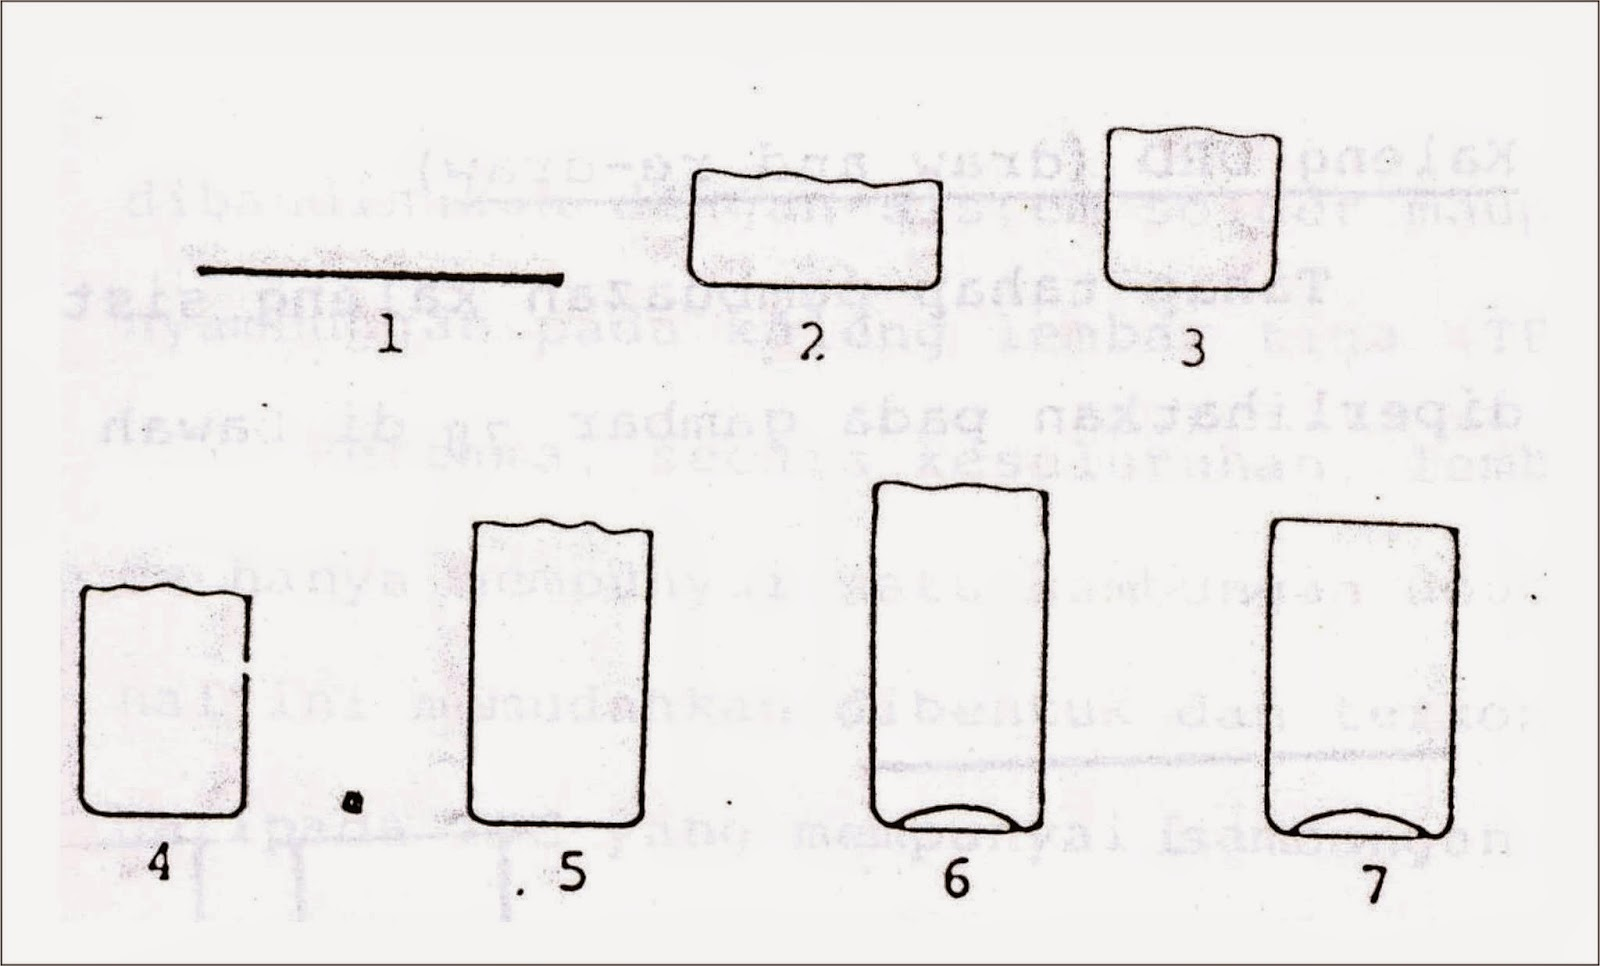 Deeuwi kemasan kaleng proses pengalengan exp nescaffe urutan proses pembuatan two pieces can tipe dwi ccuart Gallery